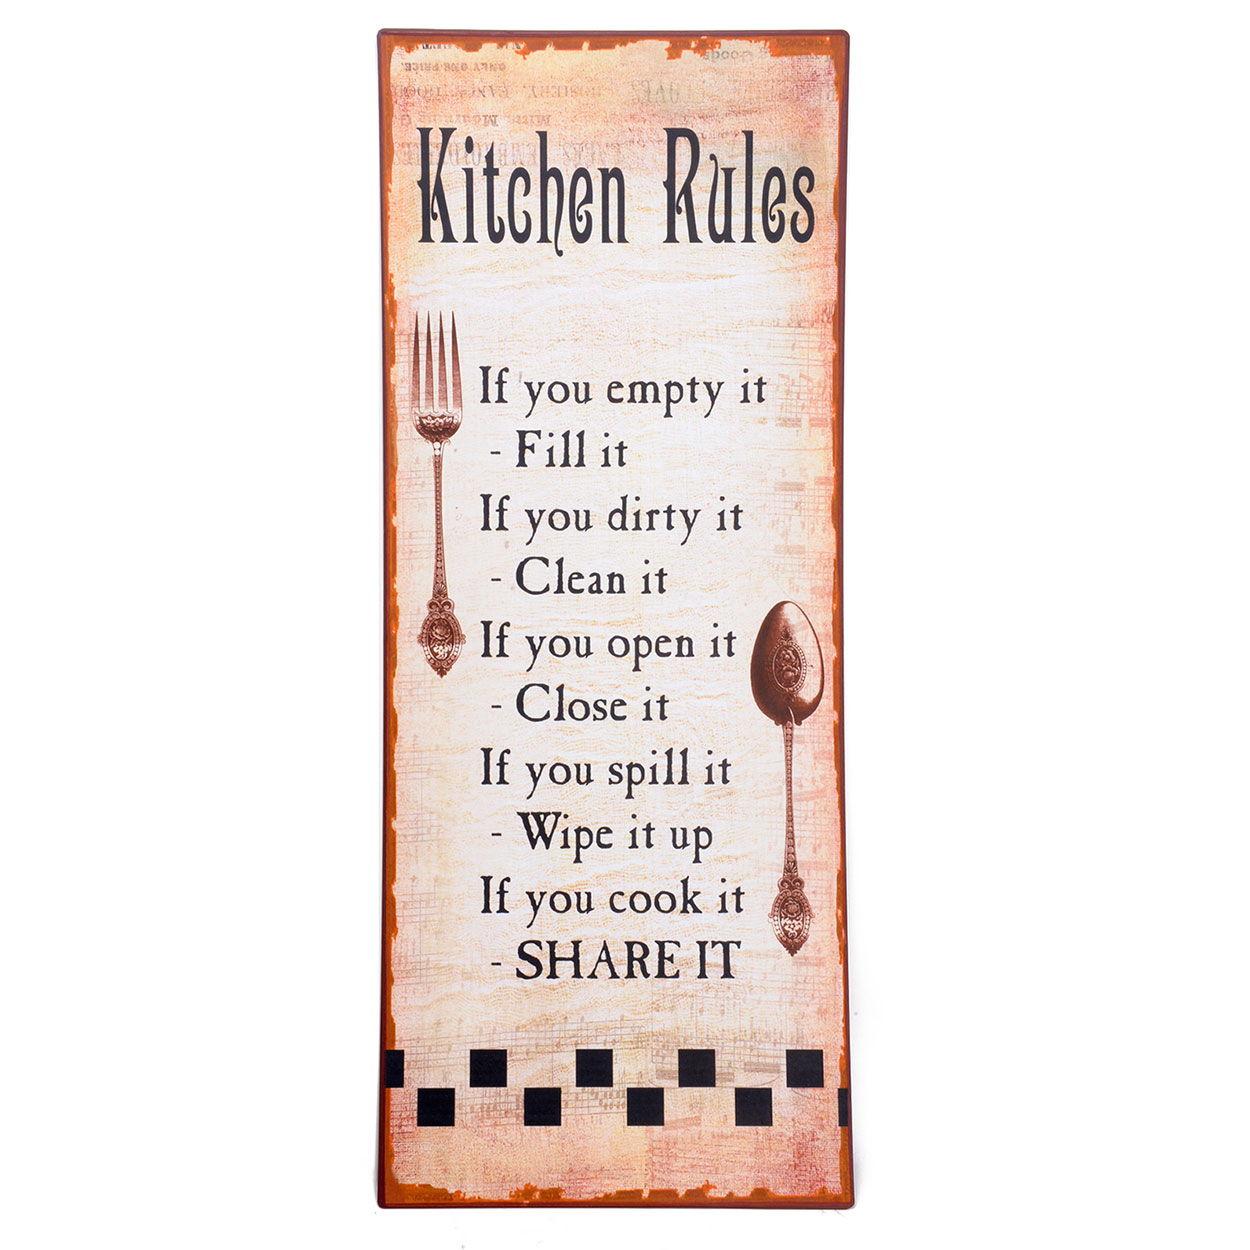 Houten Tekstbord Keuken : Metalen Tekstbord 'Kitchen Rules' Wit online kopen Lobbes.nl